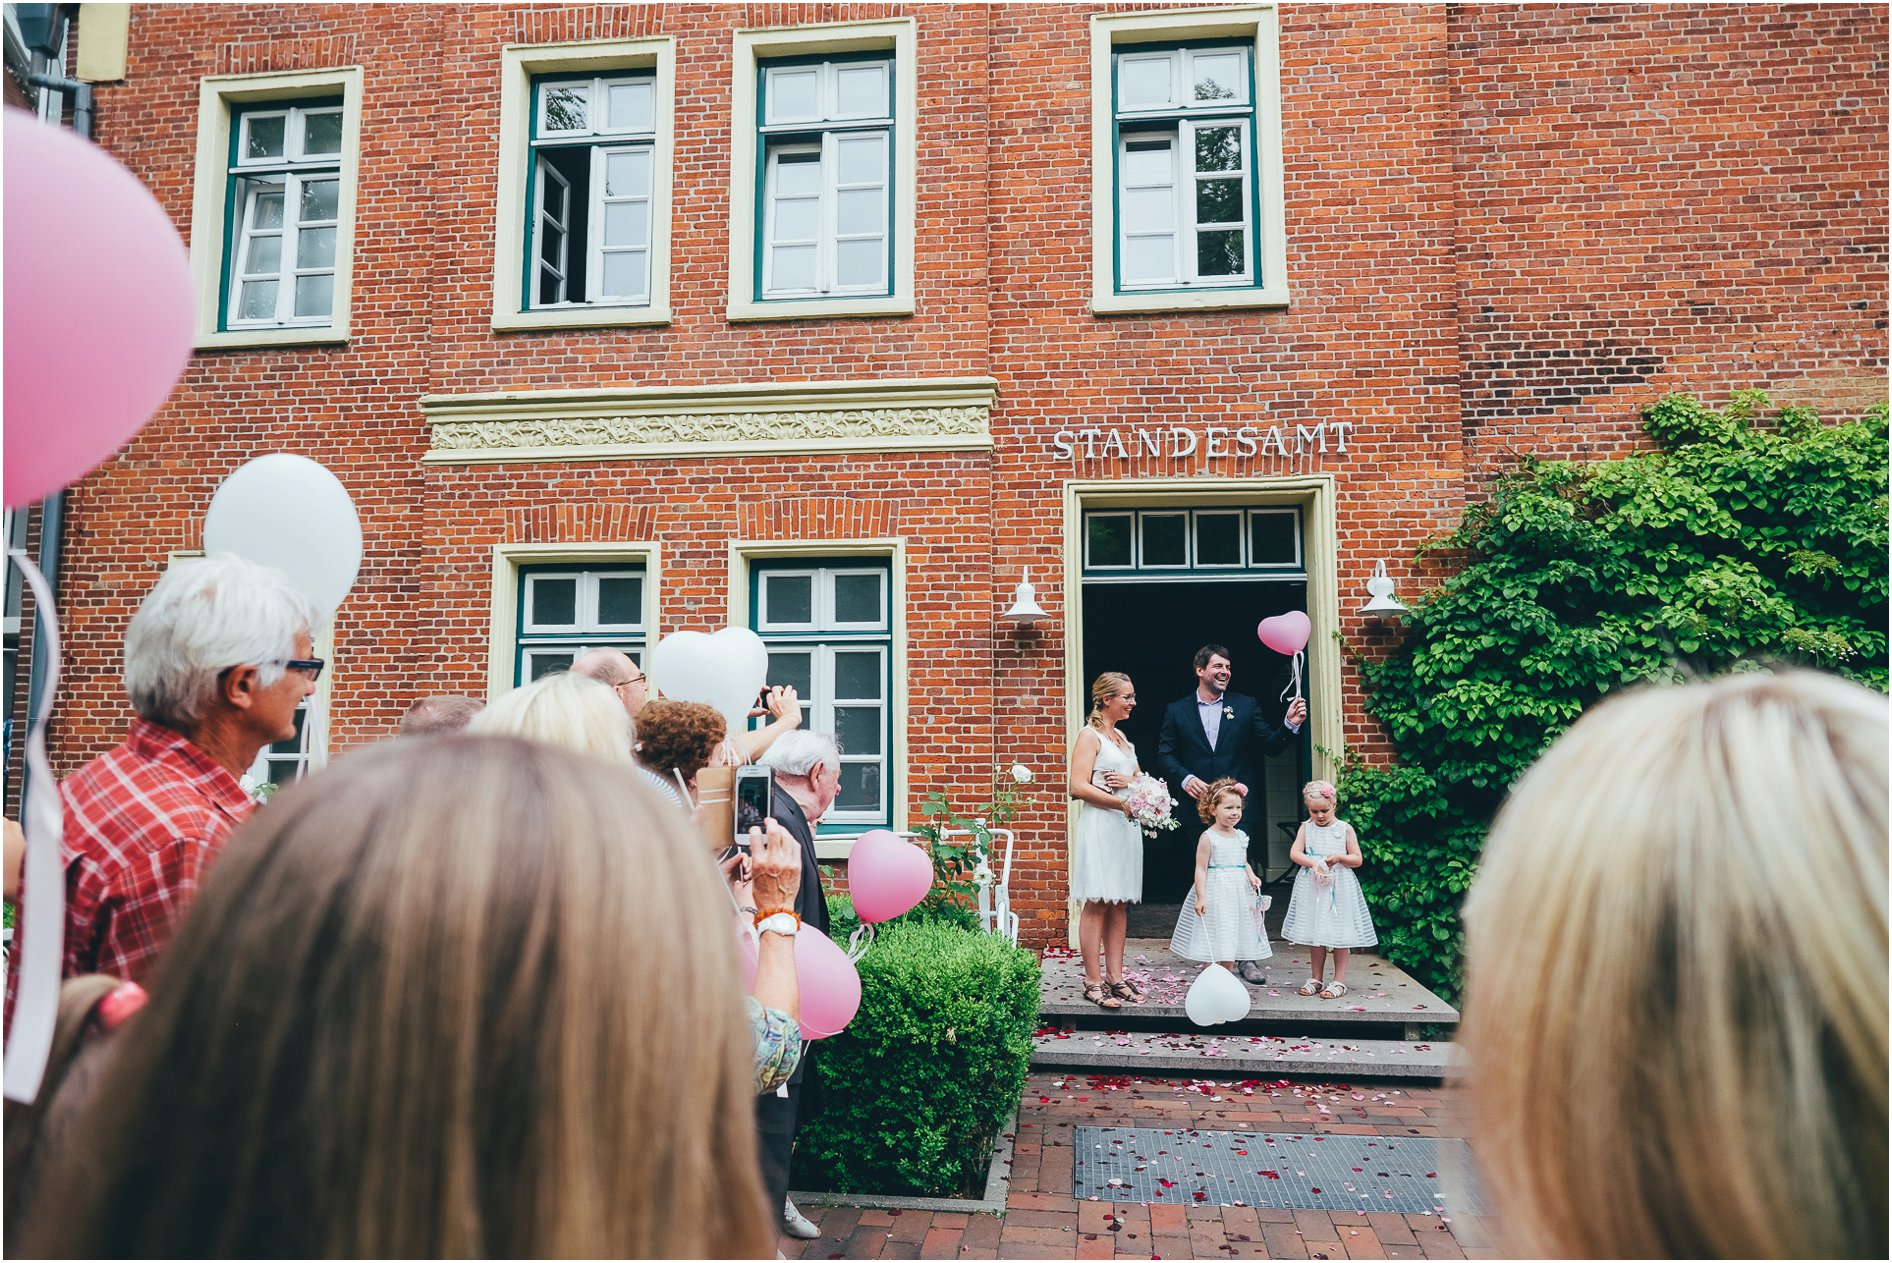 2016-04-19_0033 Sandra & Janis - Hochzeitsfotograf in Seevetal